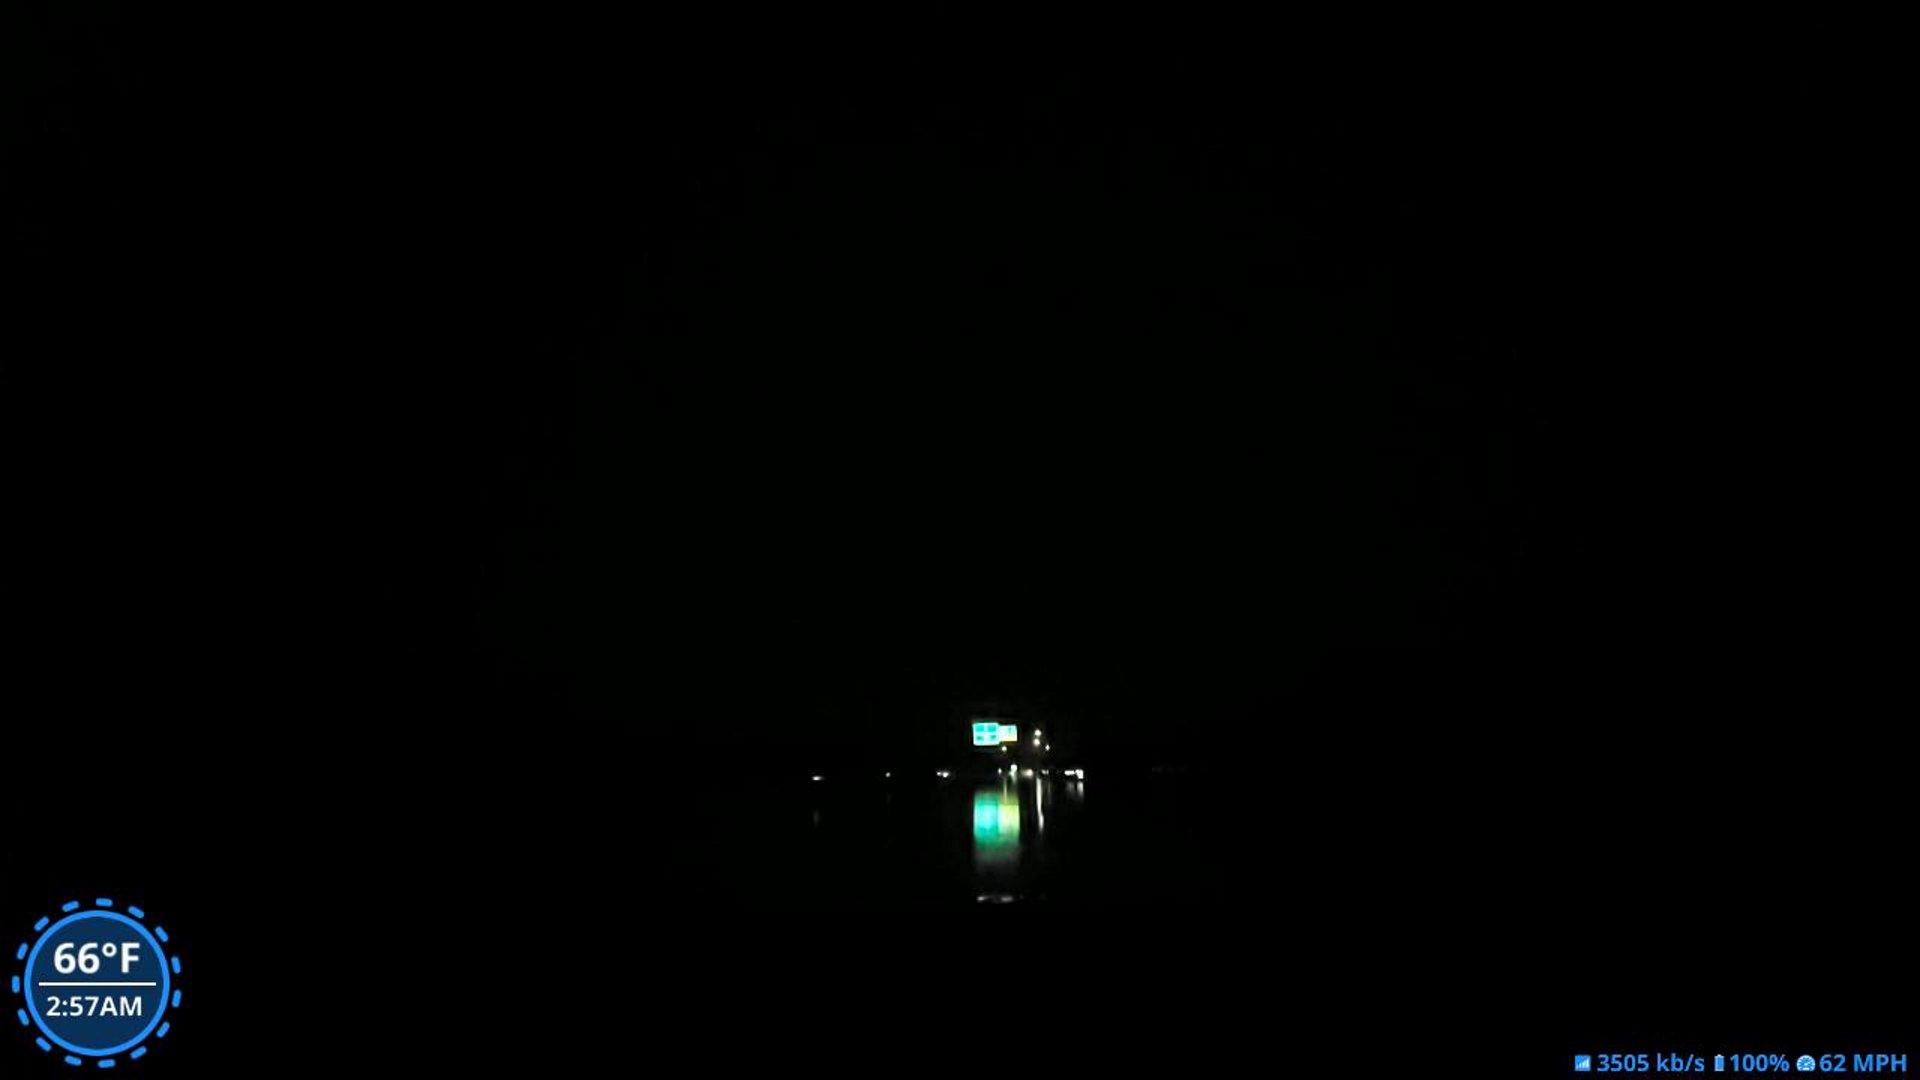 rain-asmr-uber-lyft-discord-bttv-sub-donate-luv-travel-outdoors-0259-https-t-co-t181n6winf-https-t-co-tgt78ywtmo